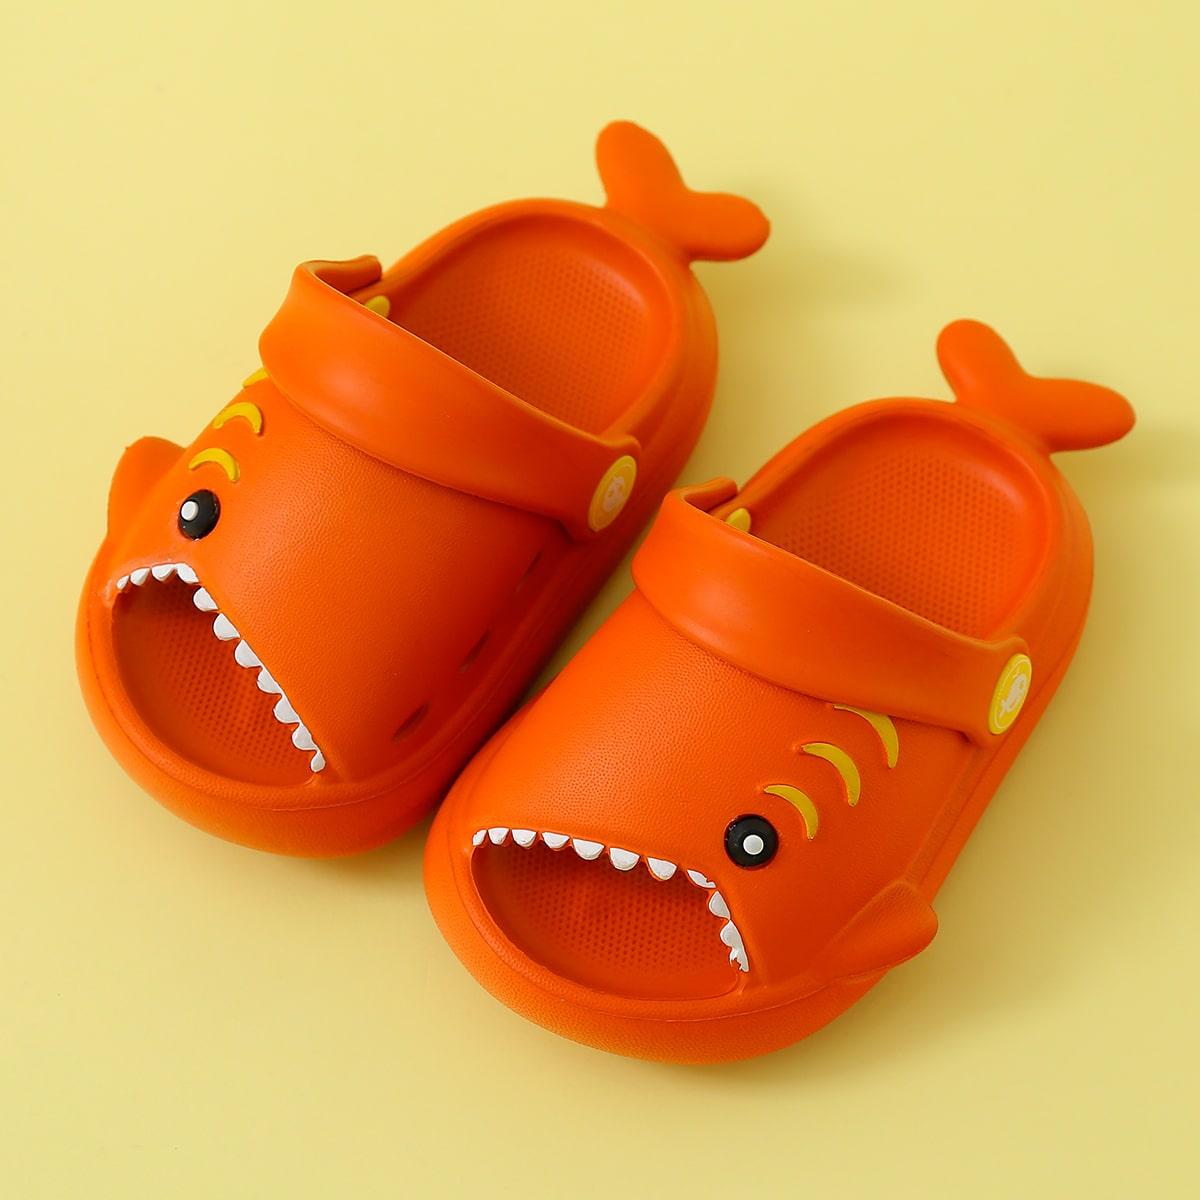 SHEIN / Toddler Boys Cartoon Shark Design Slippers